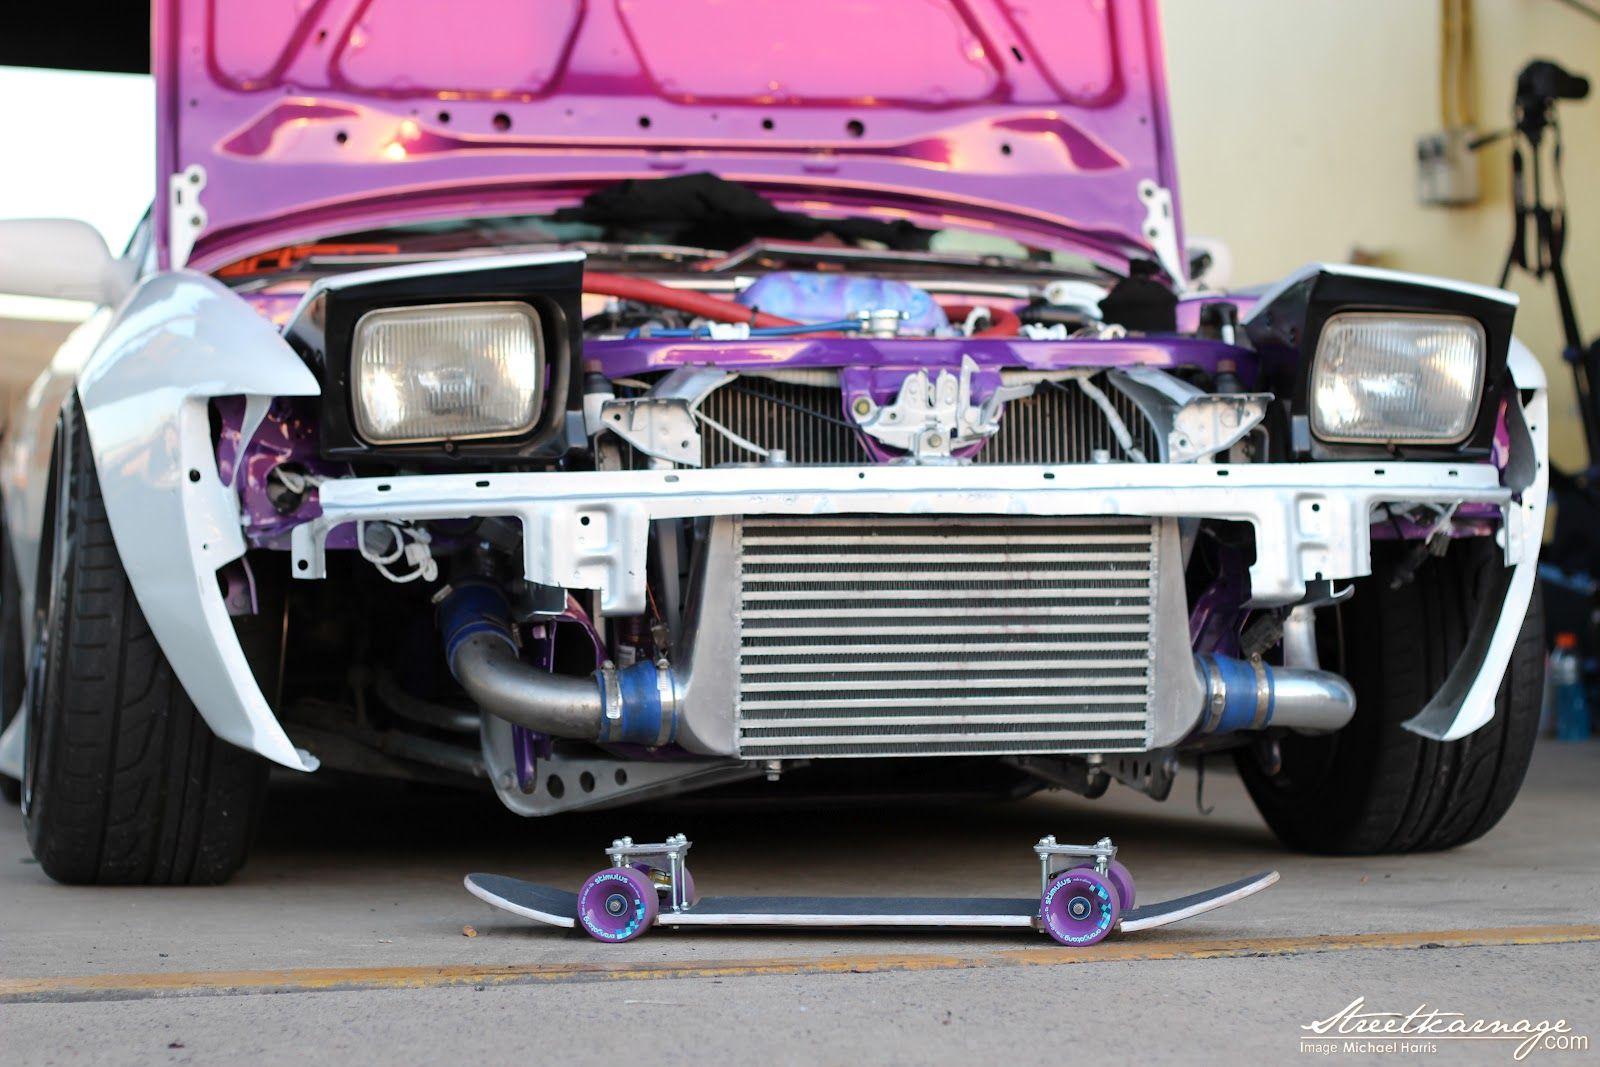 Gtrlife random gt r photo thread page 81 gt r media gt r life - Drift Fab Bash Bar Drift Fab Pinterest Cars Drifting Cars And Nissan